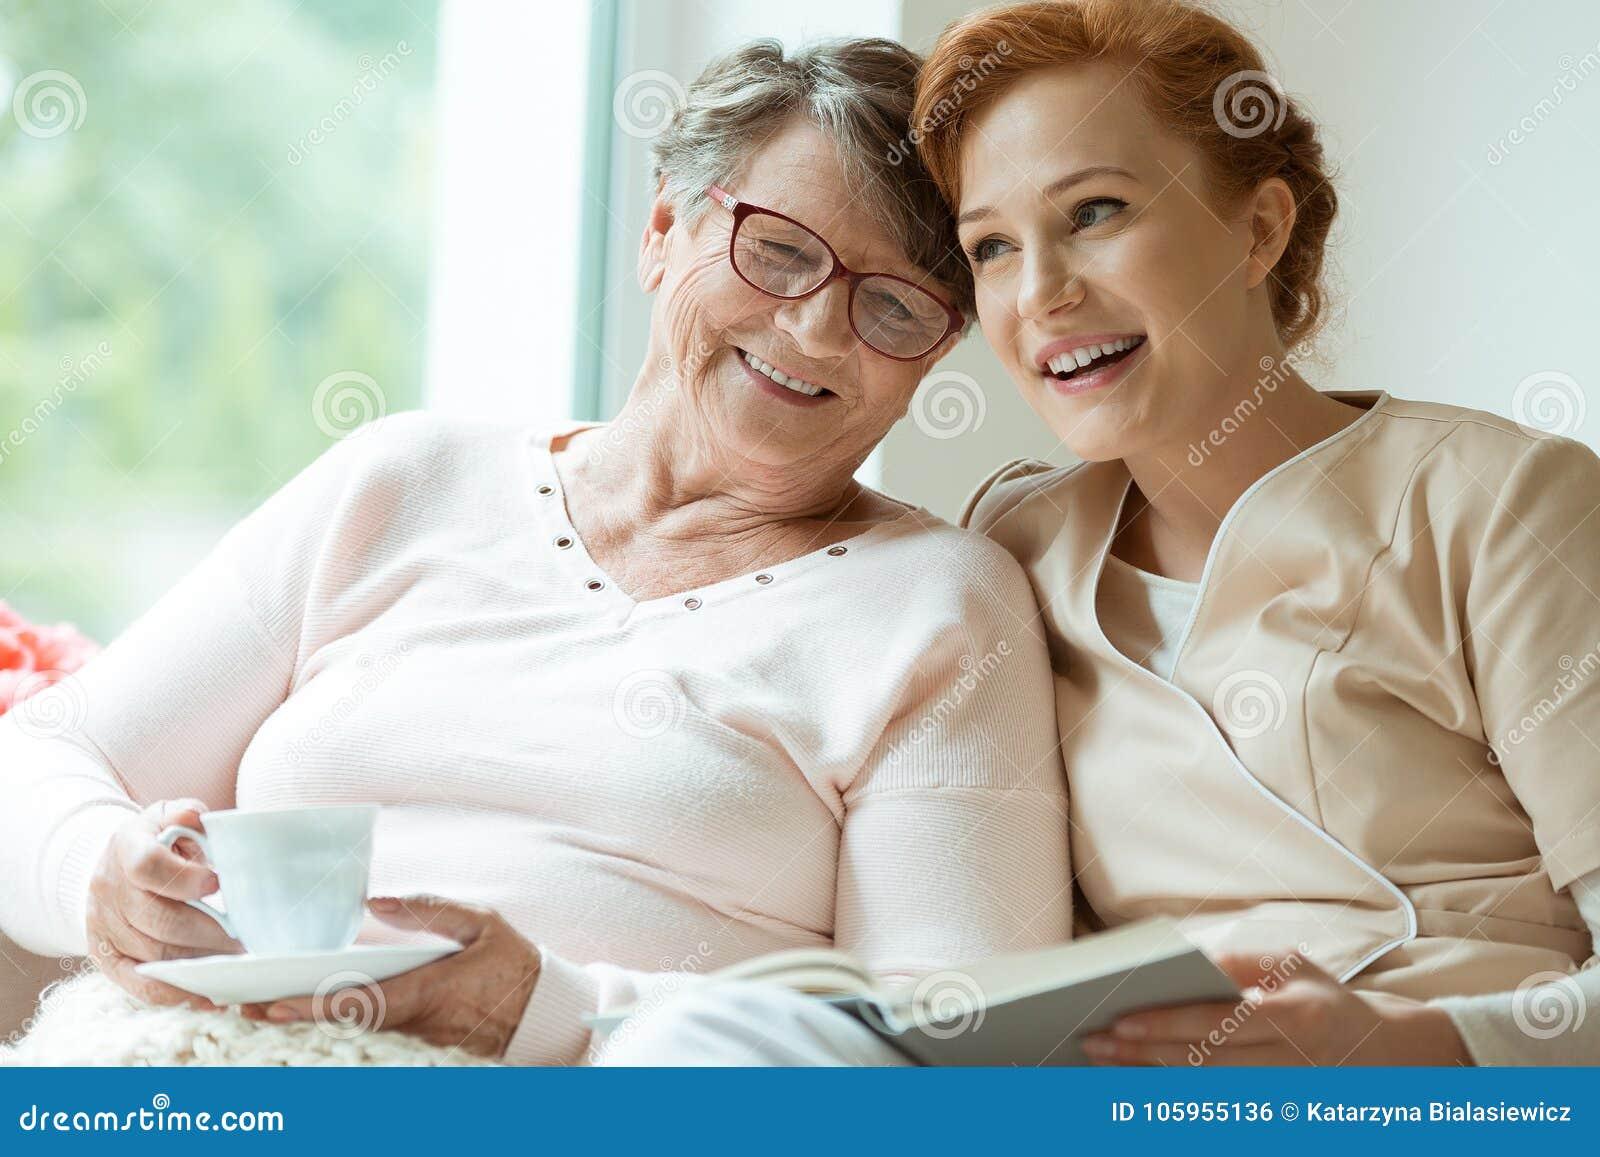 Young nurse and elder patient